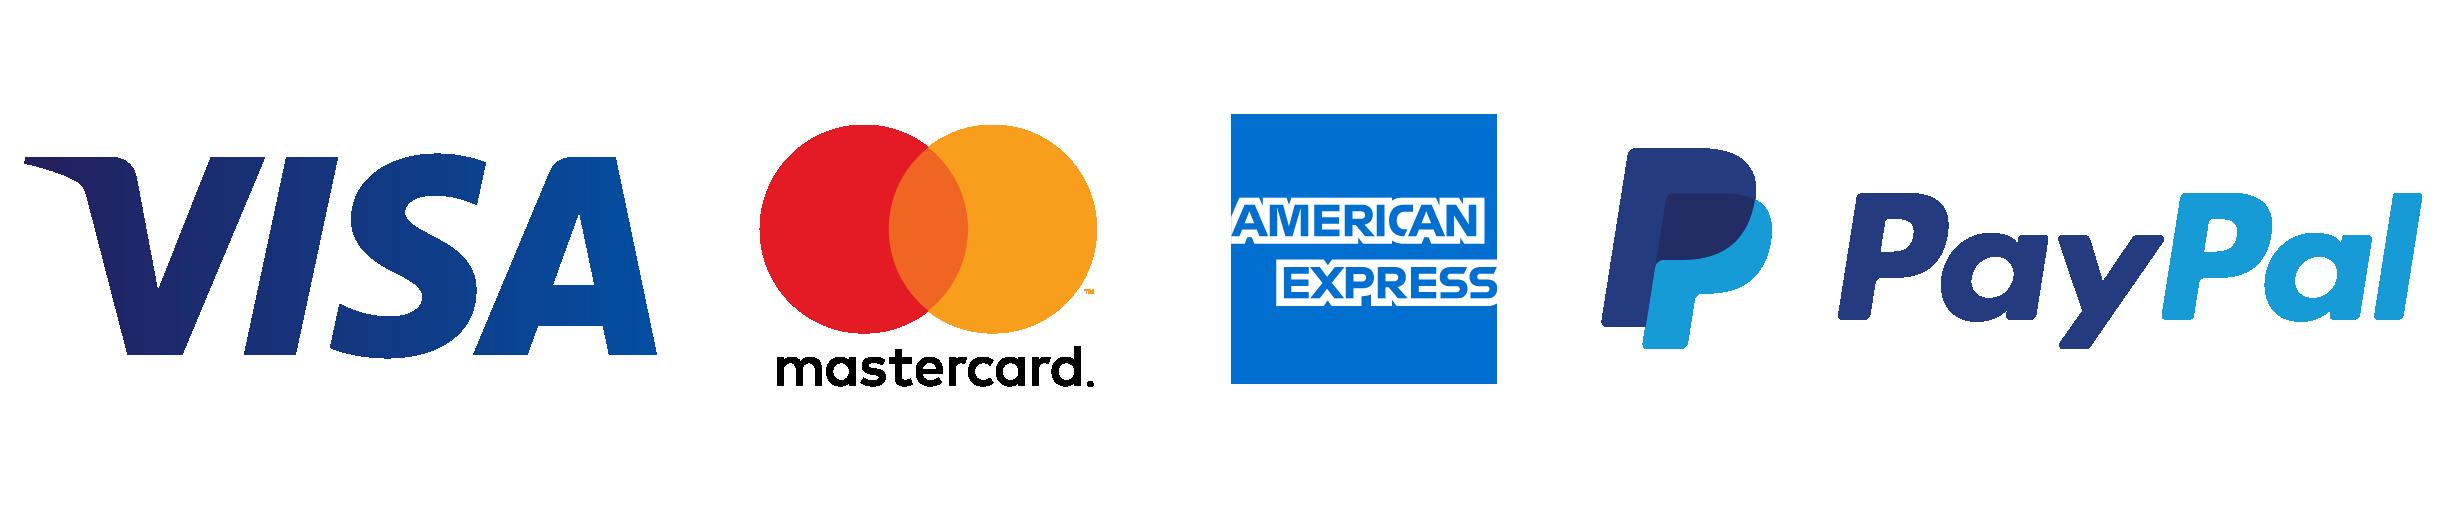 Payment methods: VISA, MasterCard, AmericanExpress, PayPal